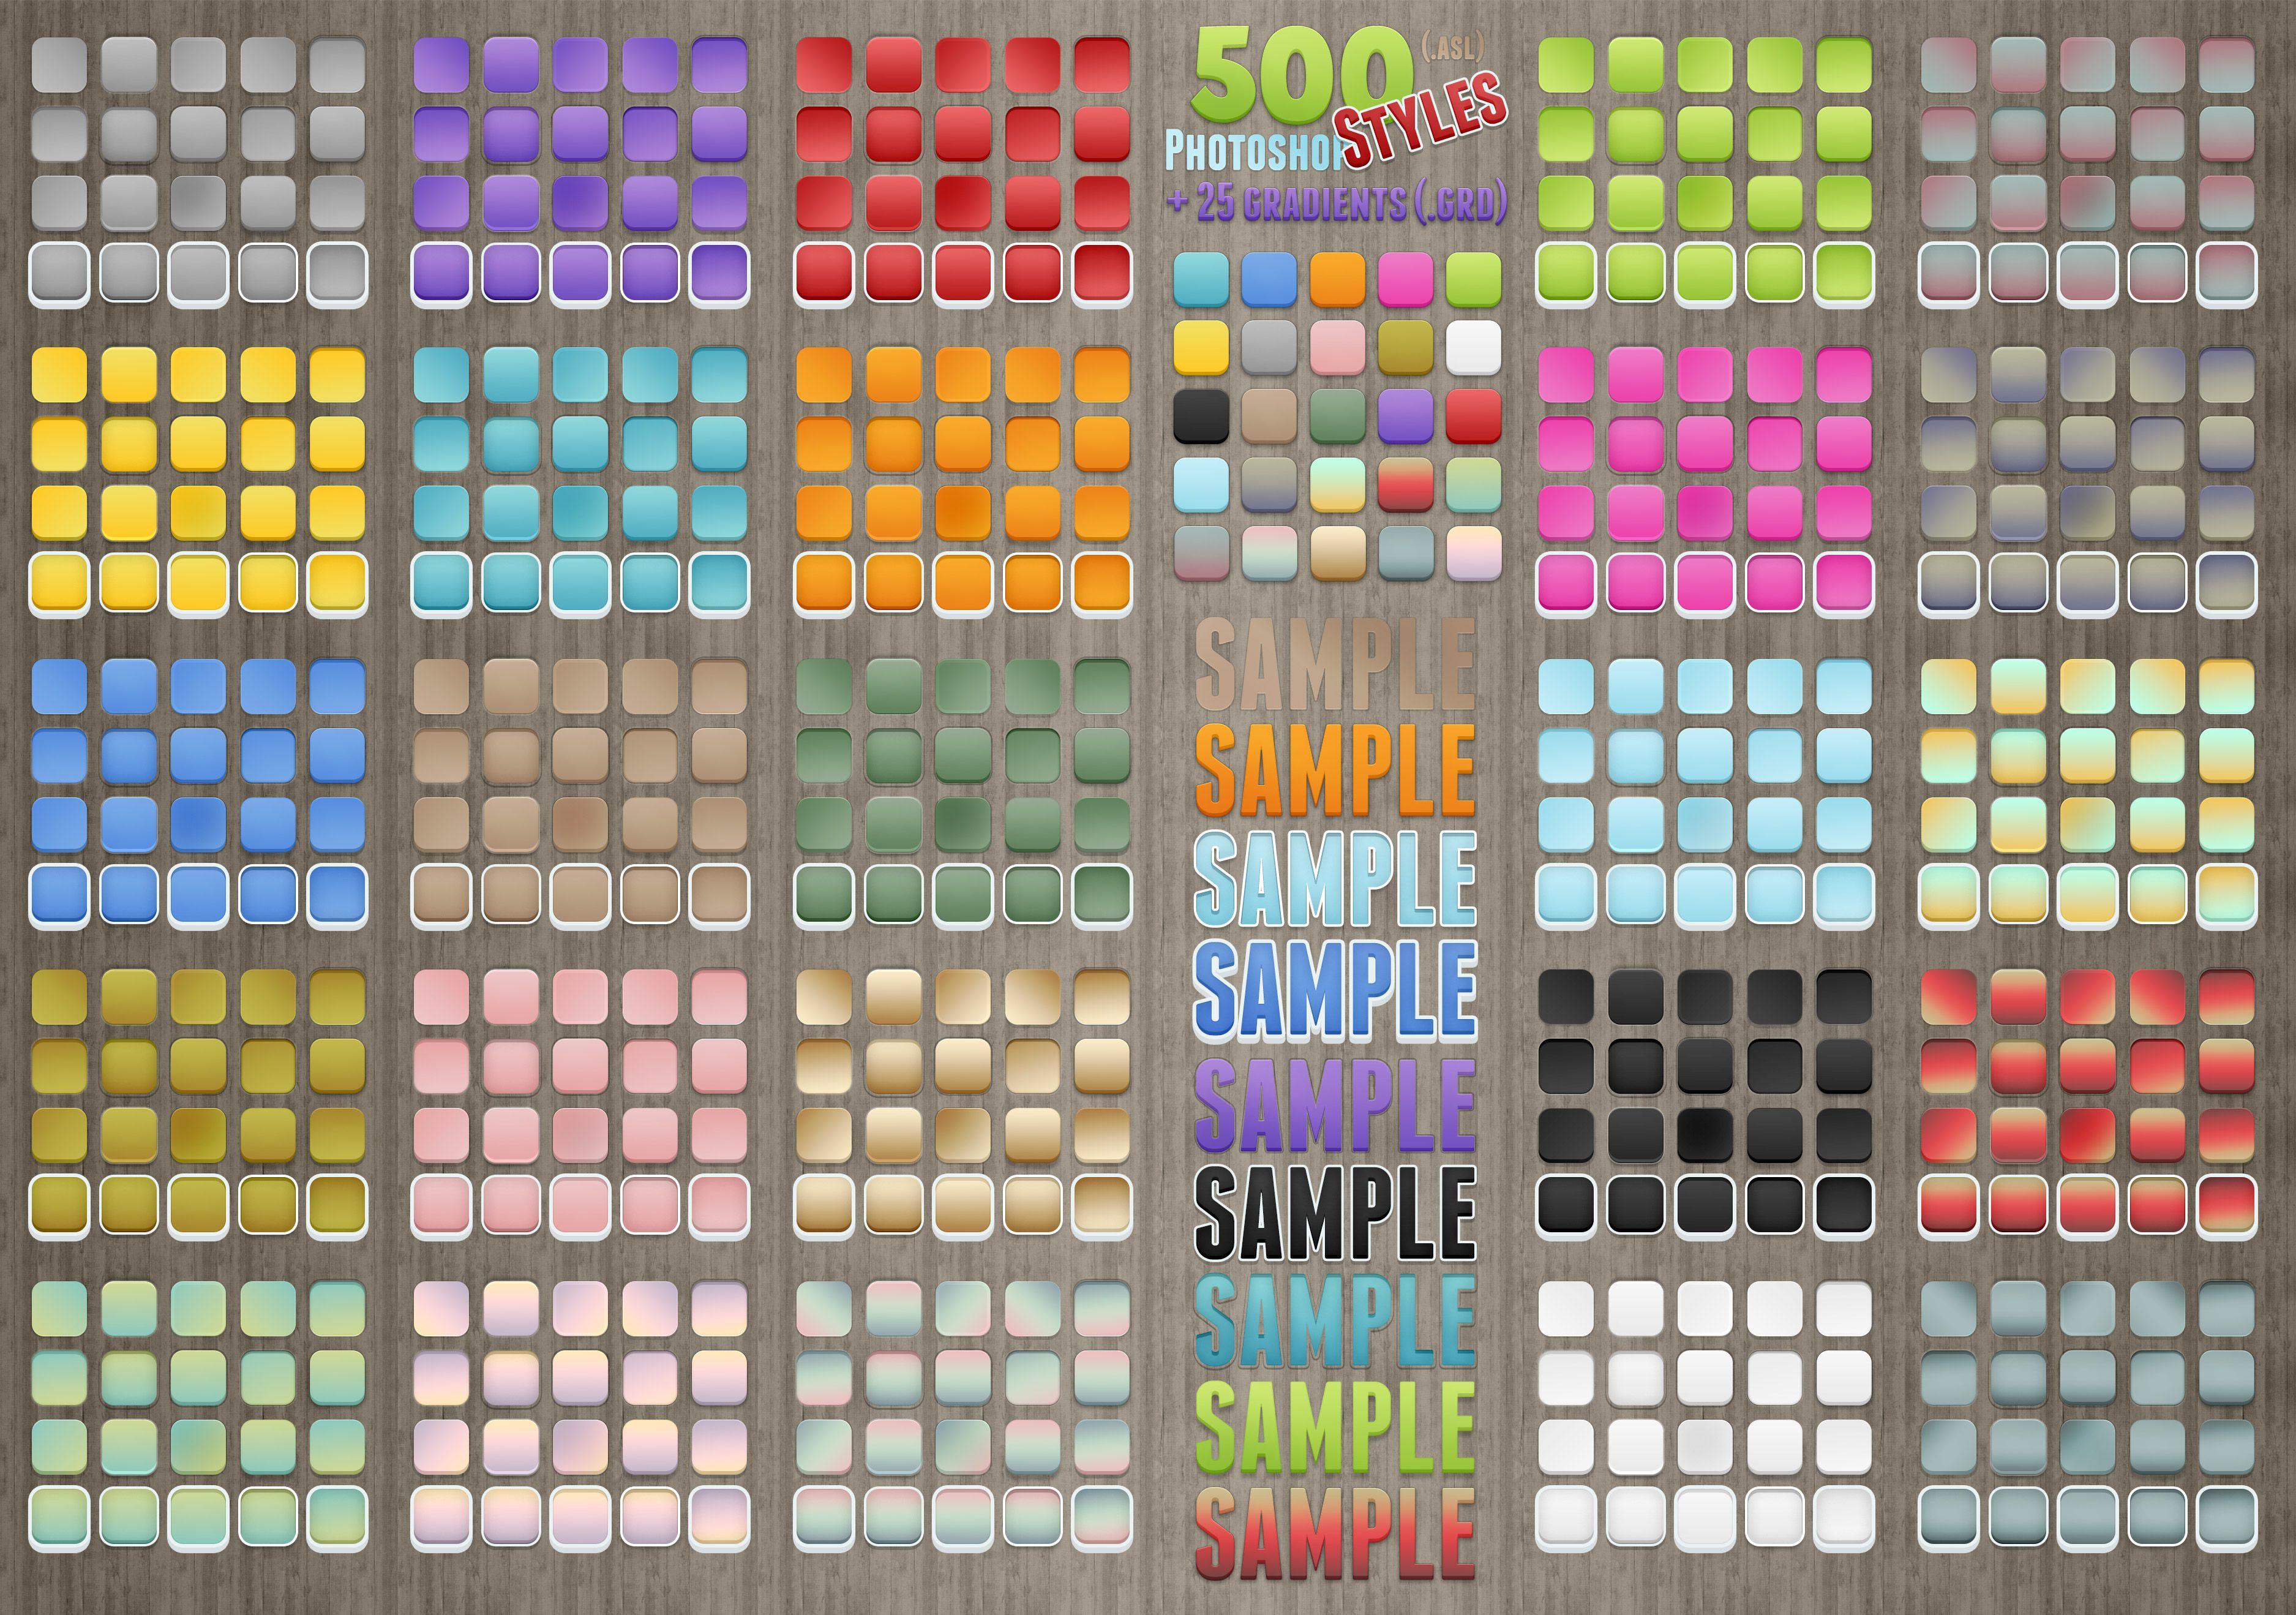 Download 500 Photoshop Styles by survivorcz | Photoshop styles ...